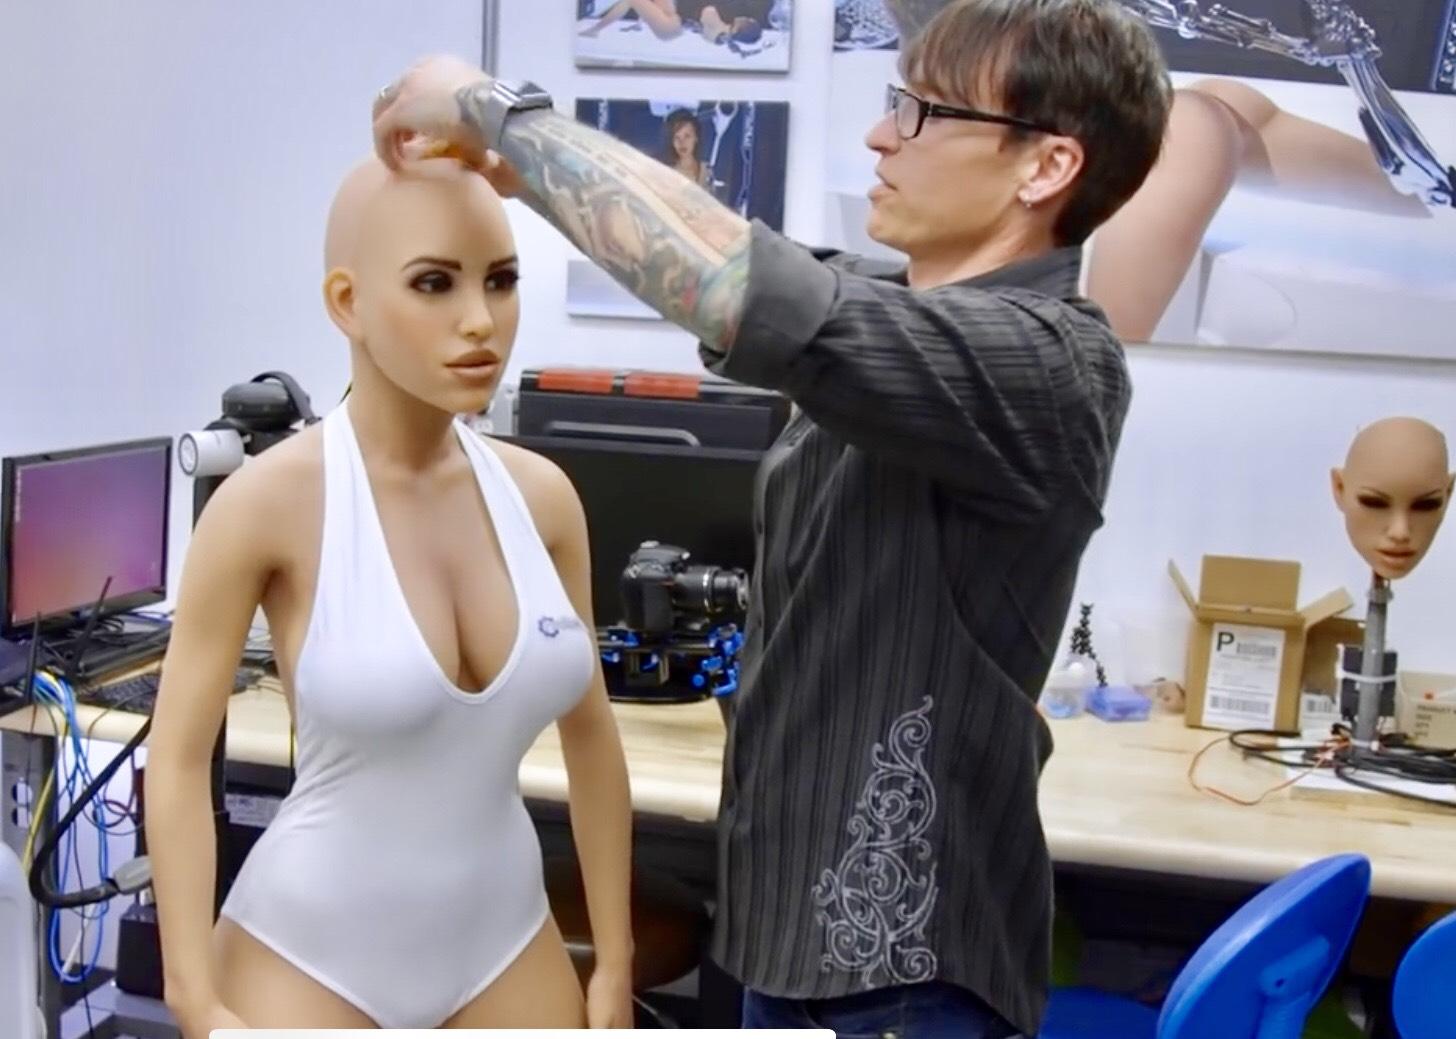 Harmony and her creator Matt McMullen, CEO of Realbotix. Source: Youtube